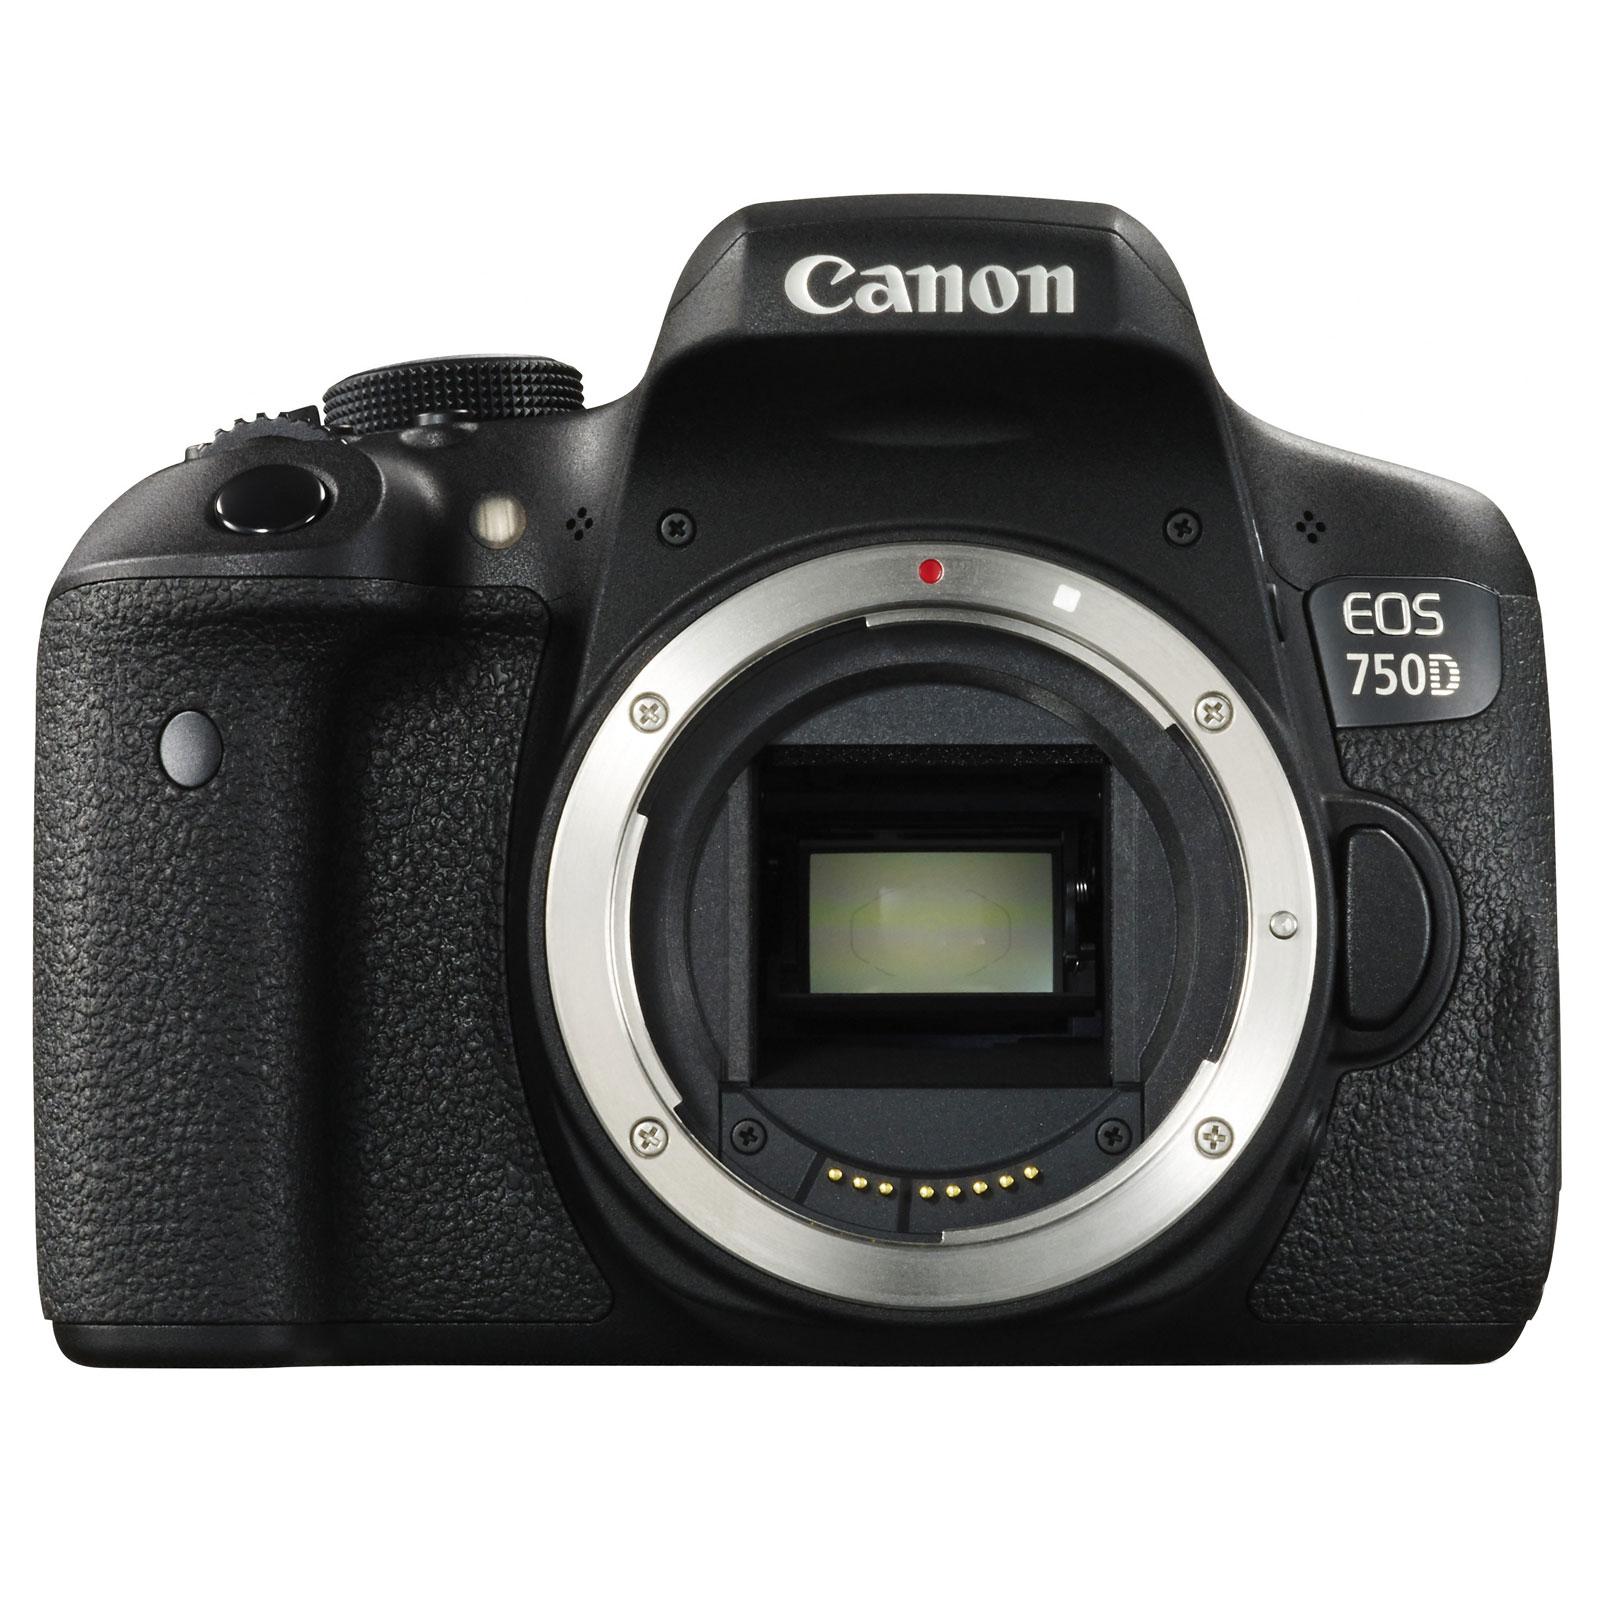 "Appareil photo Reflex Canon EOS 750D Reflex Numérique 24.2 MP - Ecran tactile 3"" - Vidéo Full HD - Wi-Fi - NFC (boîtier nu)"